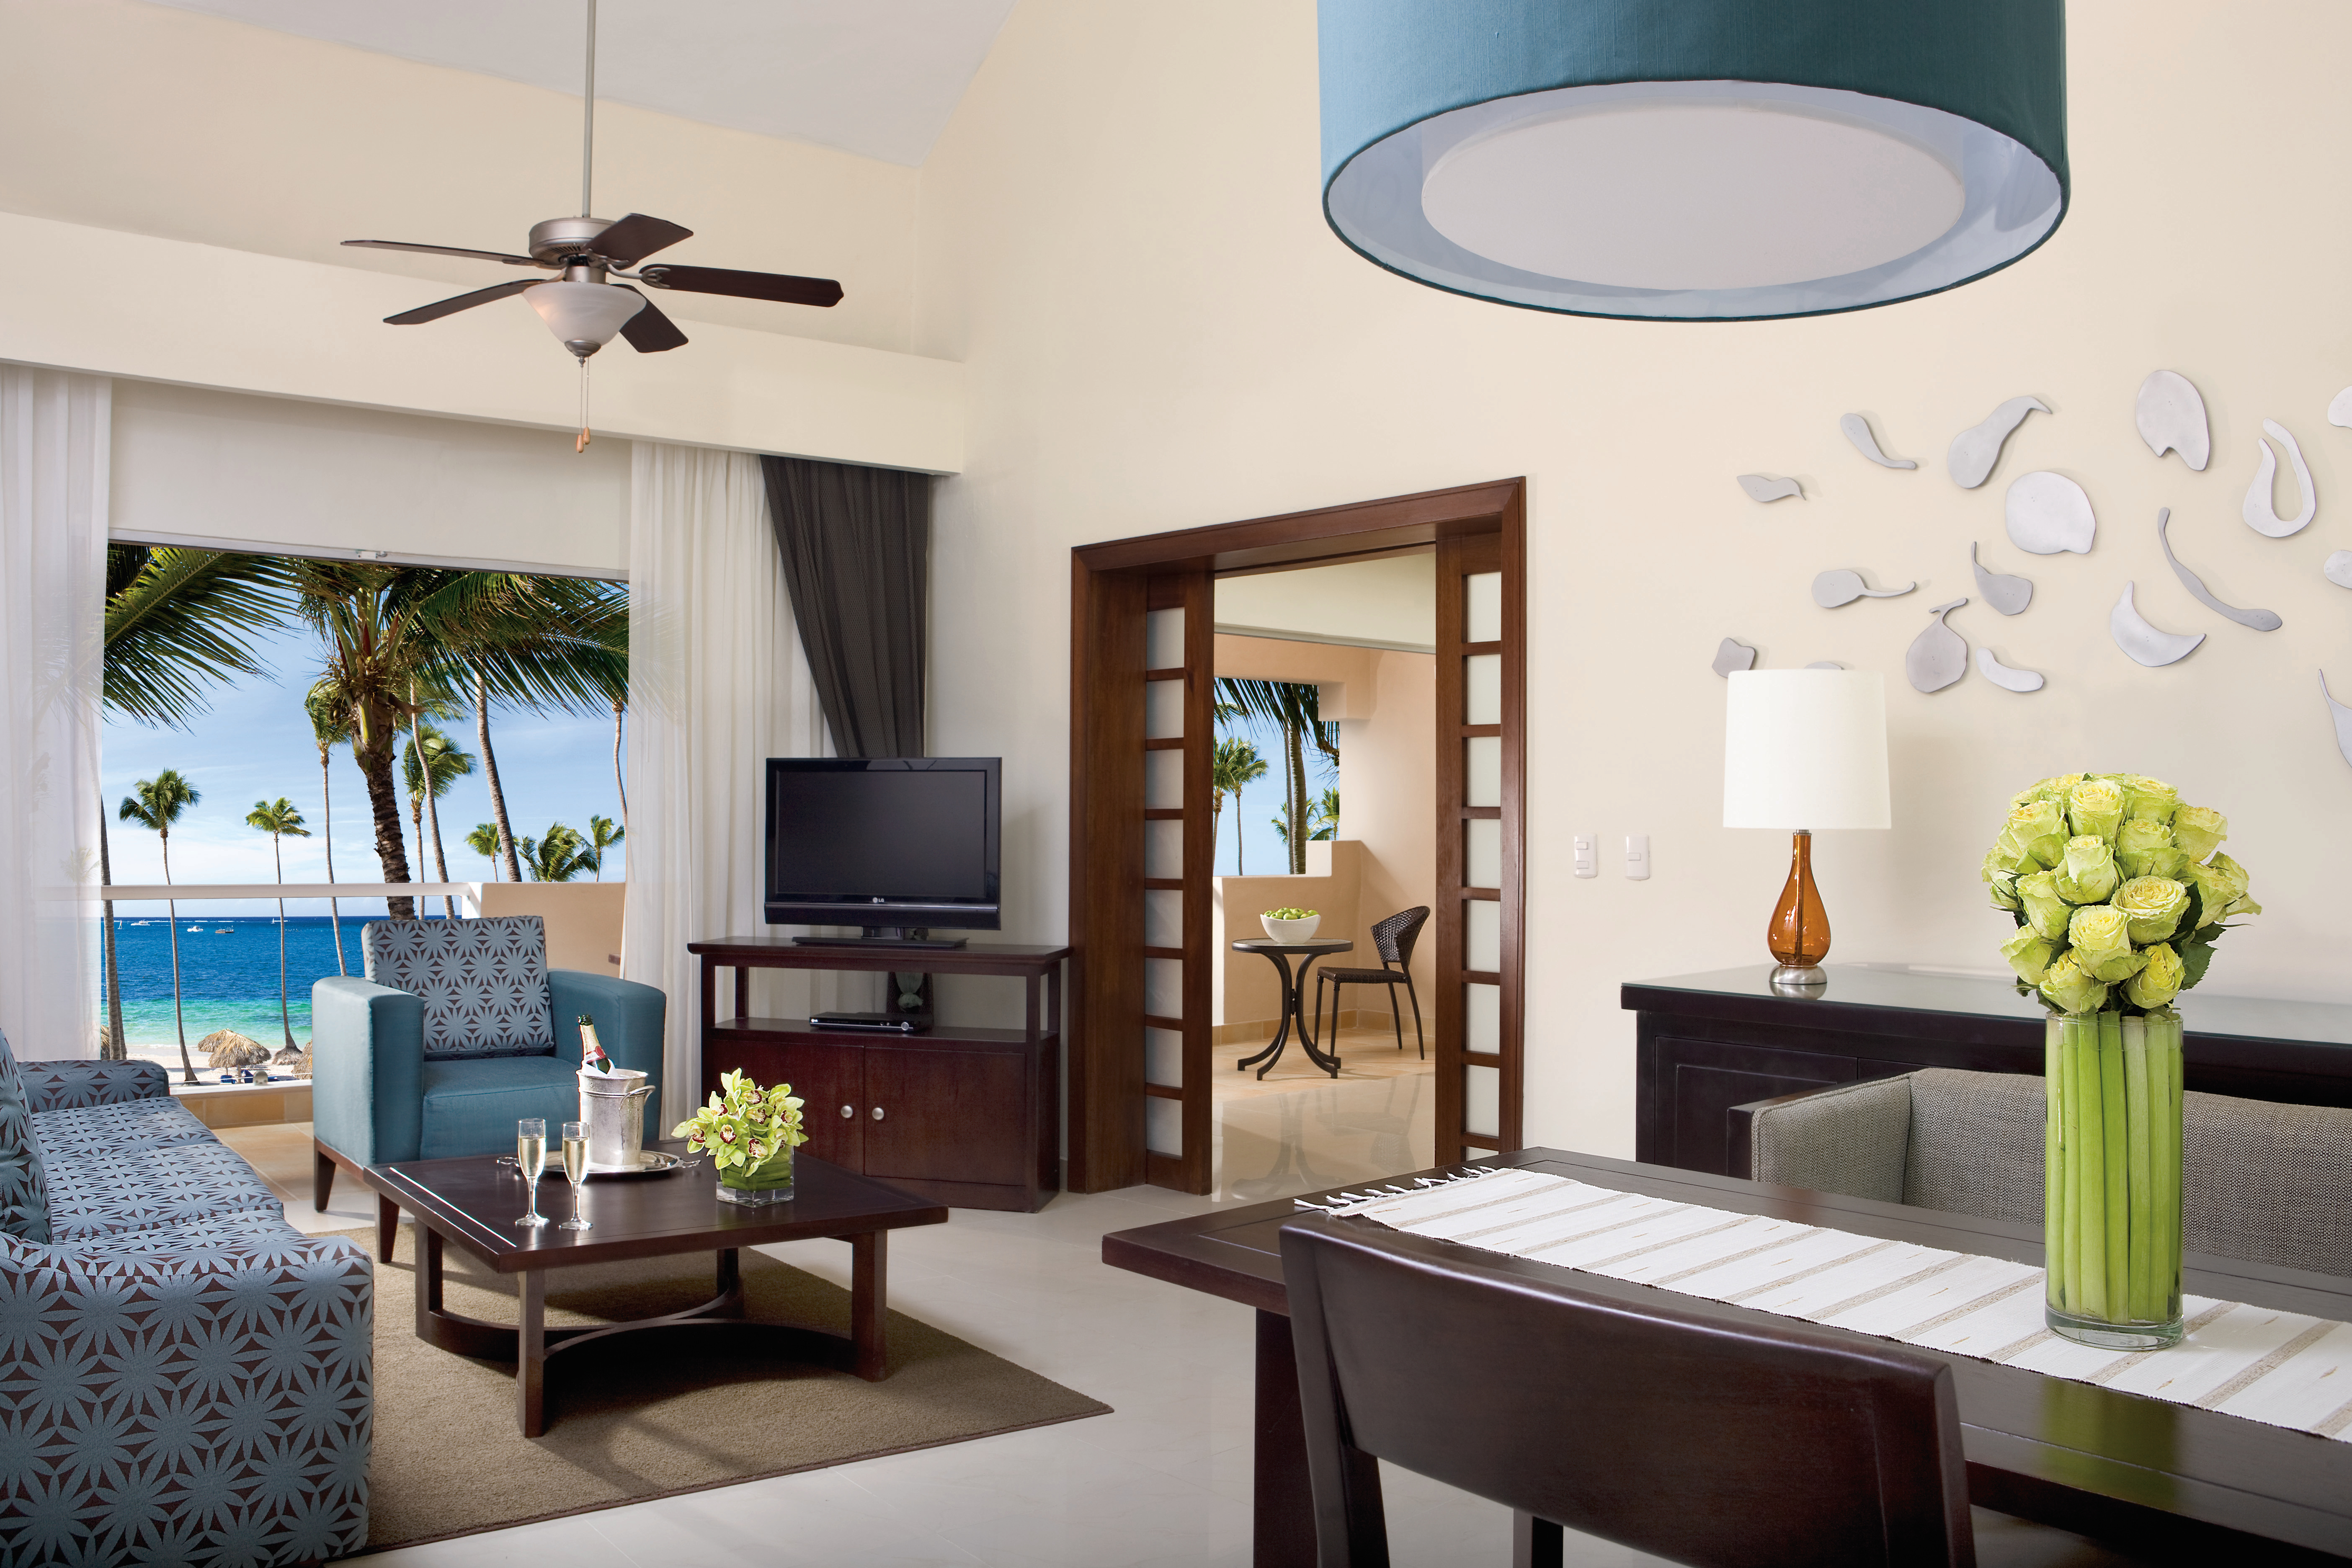 Travel Agency All-Inclusive Resort Dreams Palm Beach 33